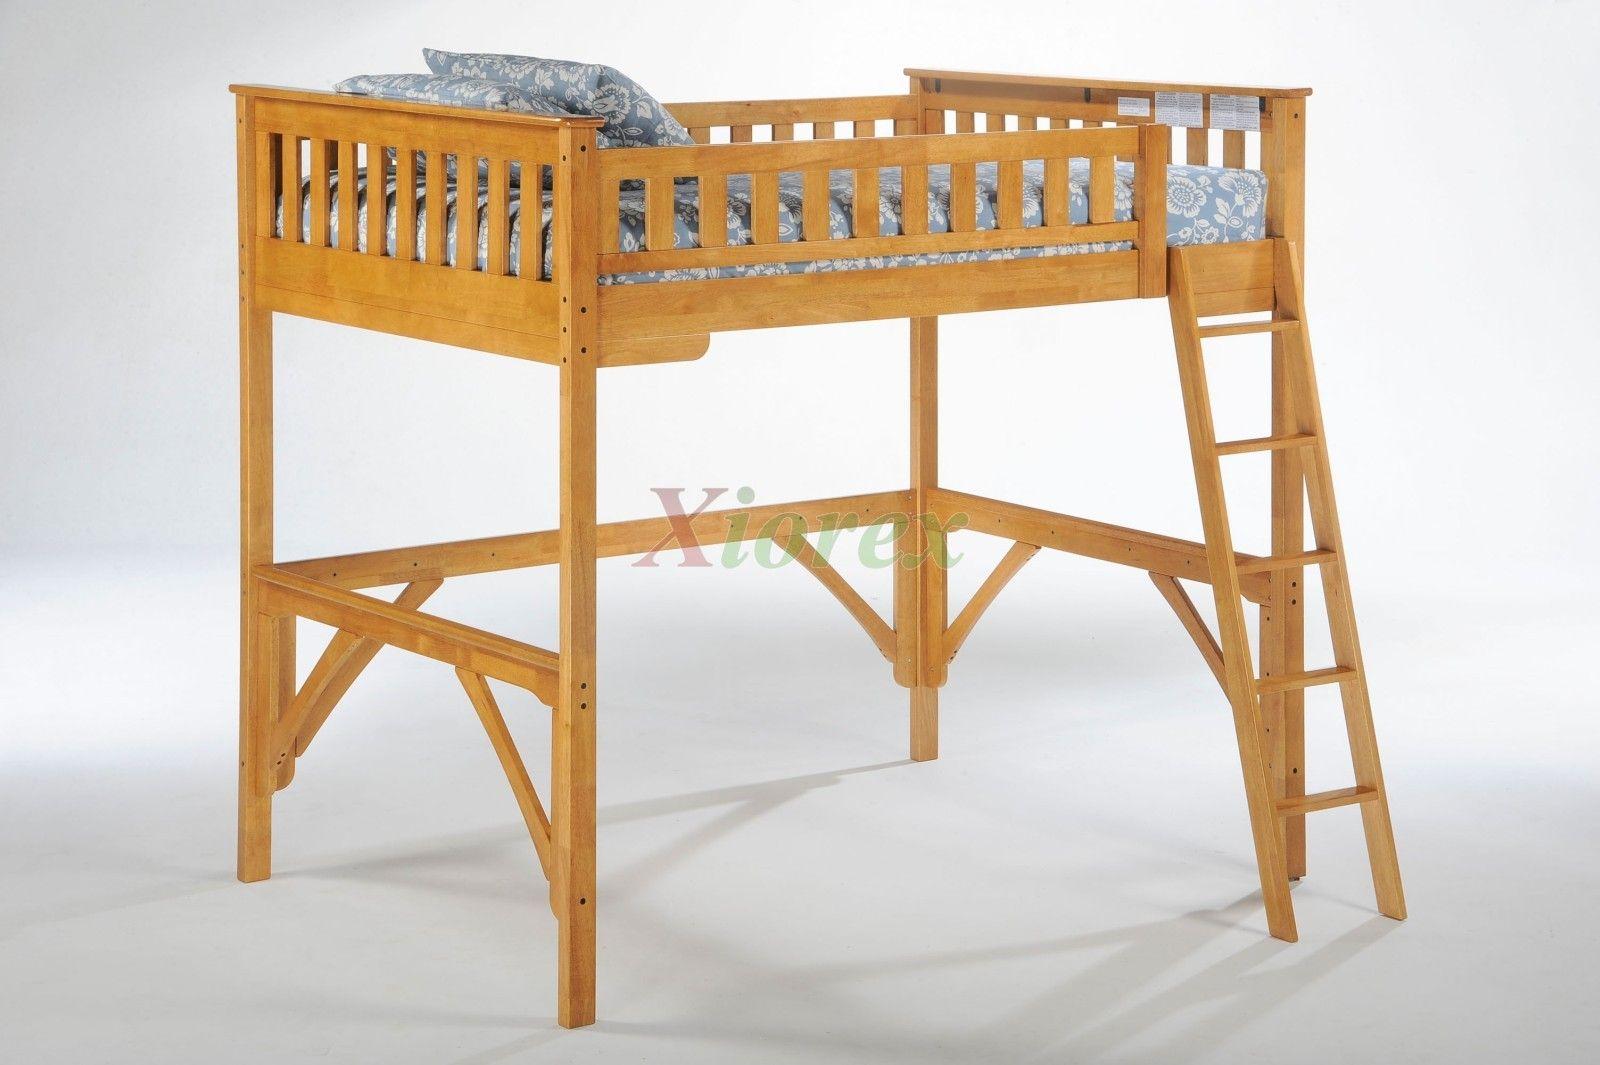 Twin Loft Bed Medium Oak Bunk Ginger Loft Bed | Xiorex Loft Furniture  Ginger Loft Bunk